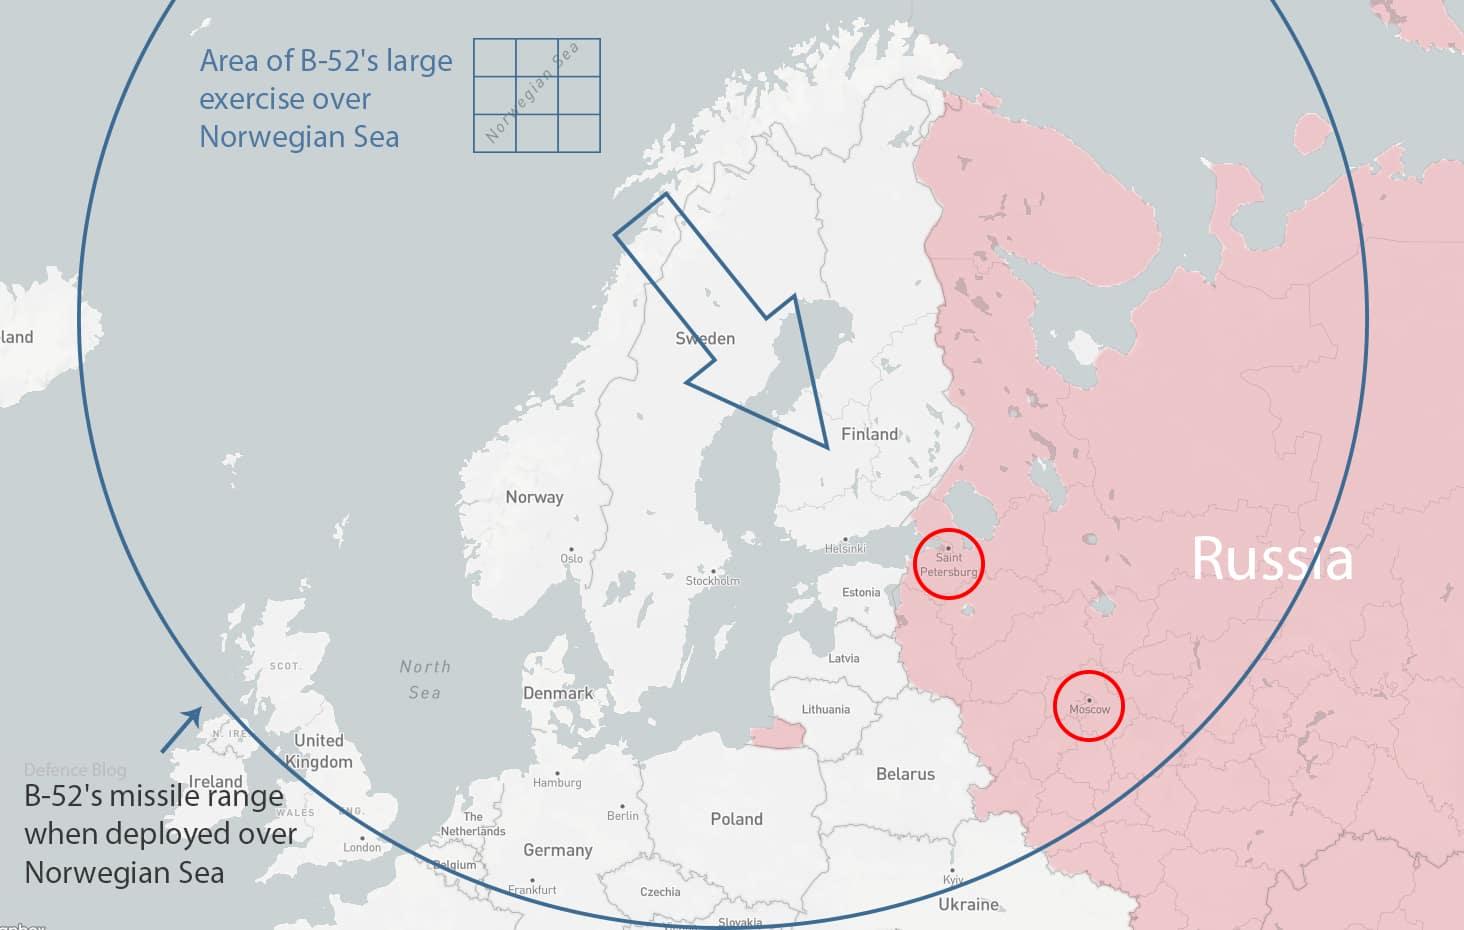 Five U.S. B-52 bombers simulated mock nuclear strike against targets in Russia